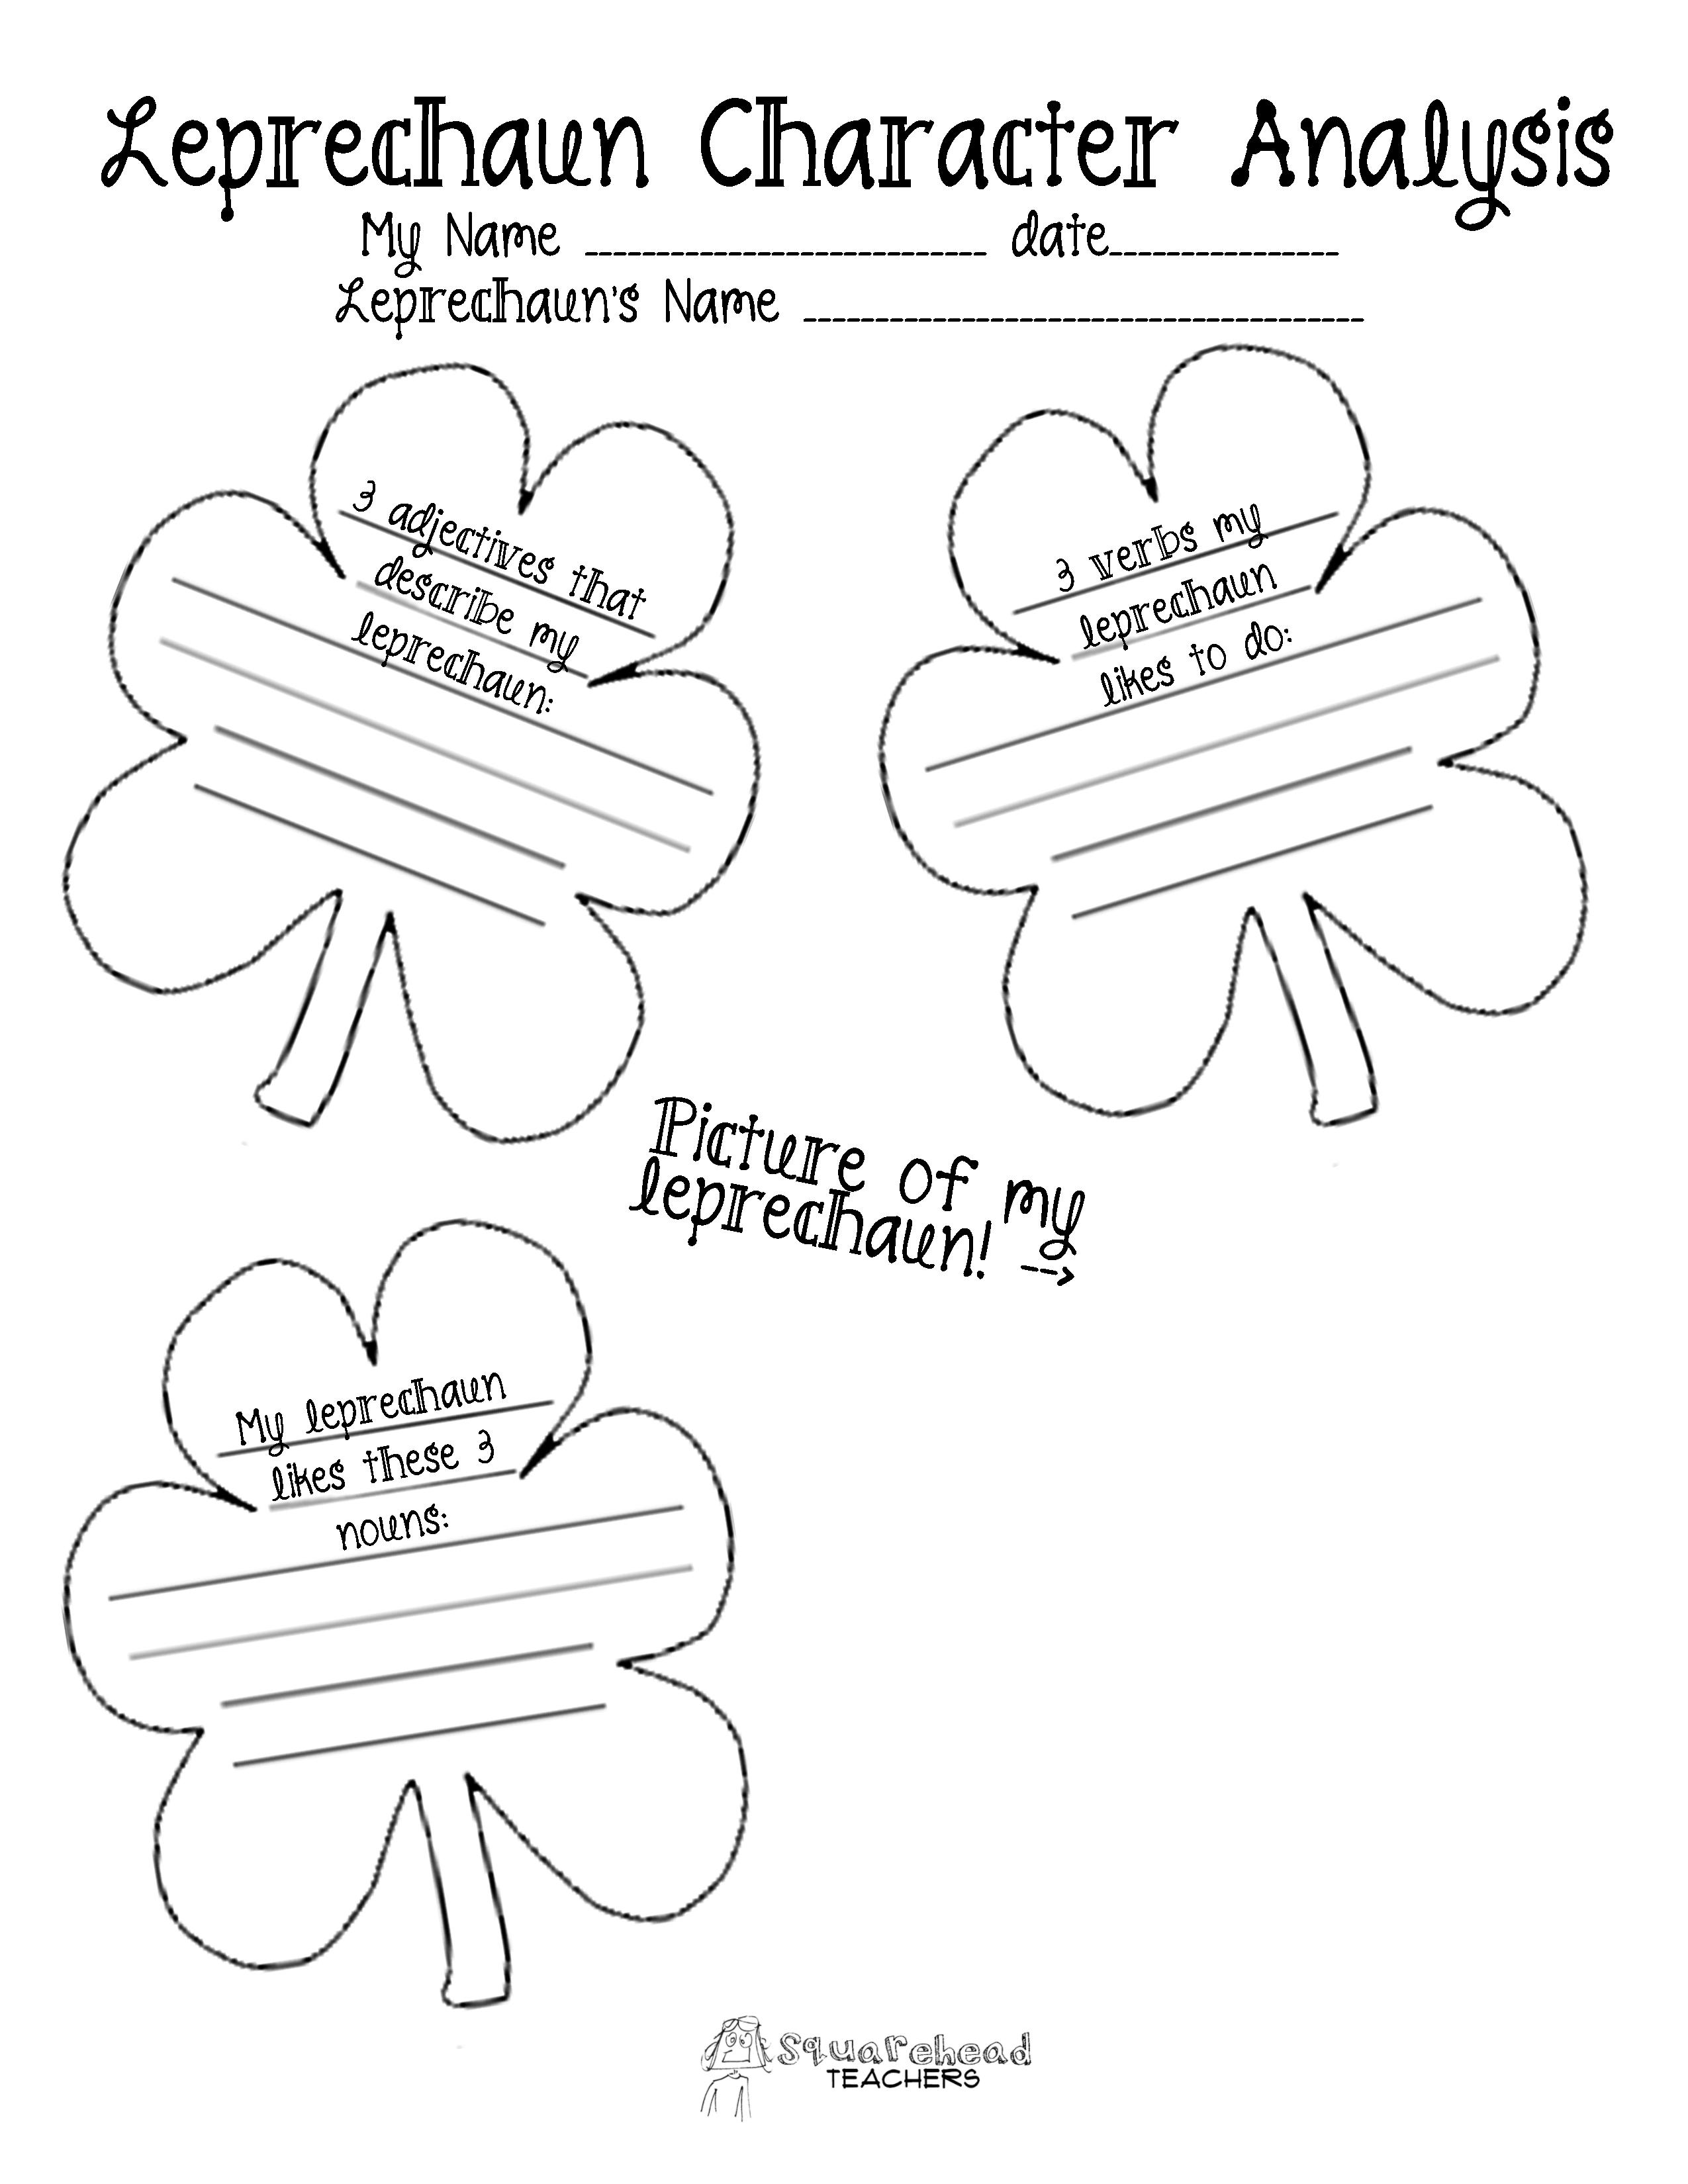 Leprechaun Characterysis Writing Updated